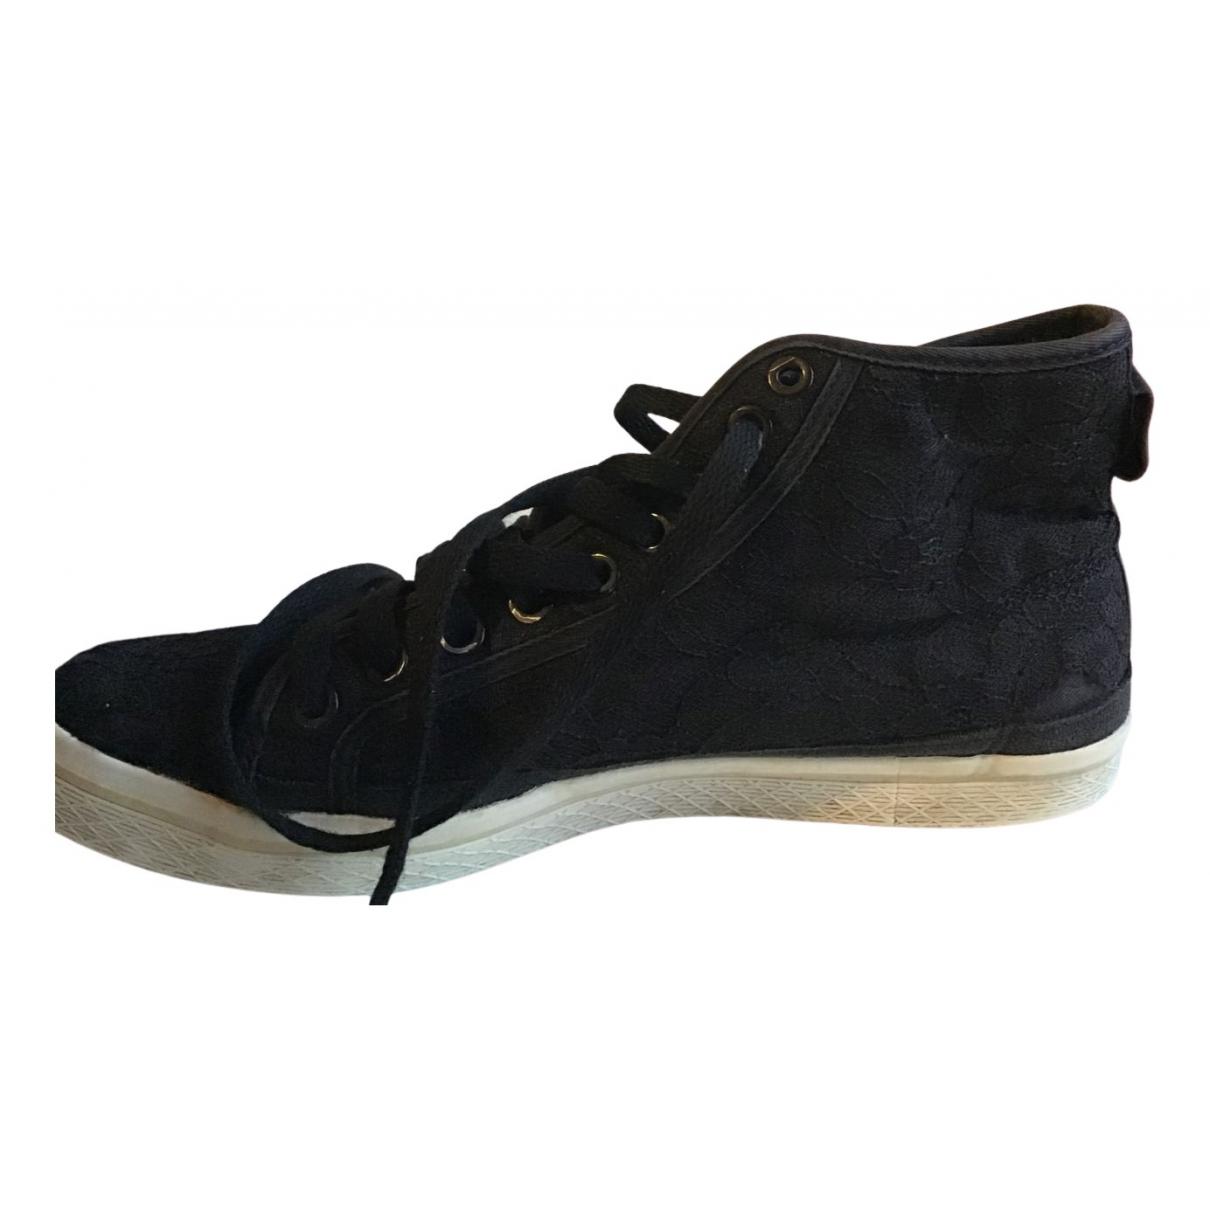 Adidas N Black Cloth Trainers for Women 40.5 EU